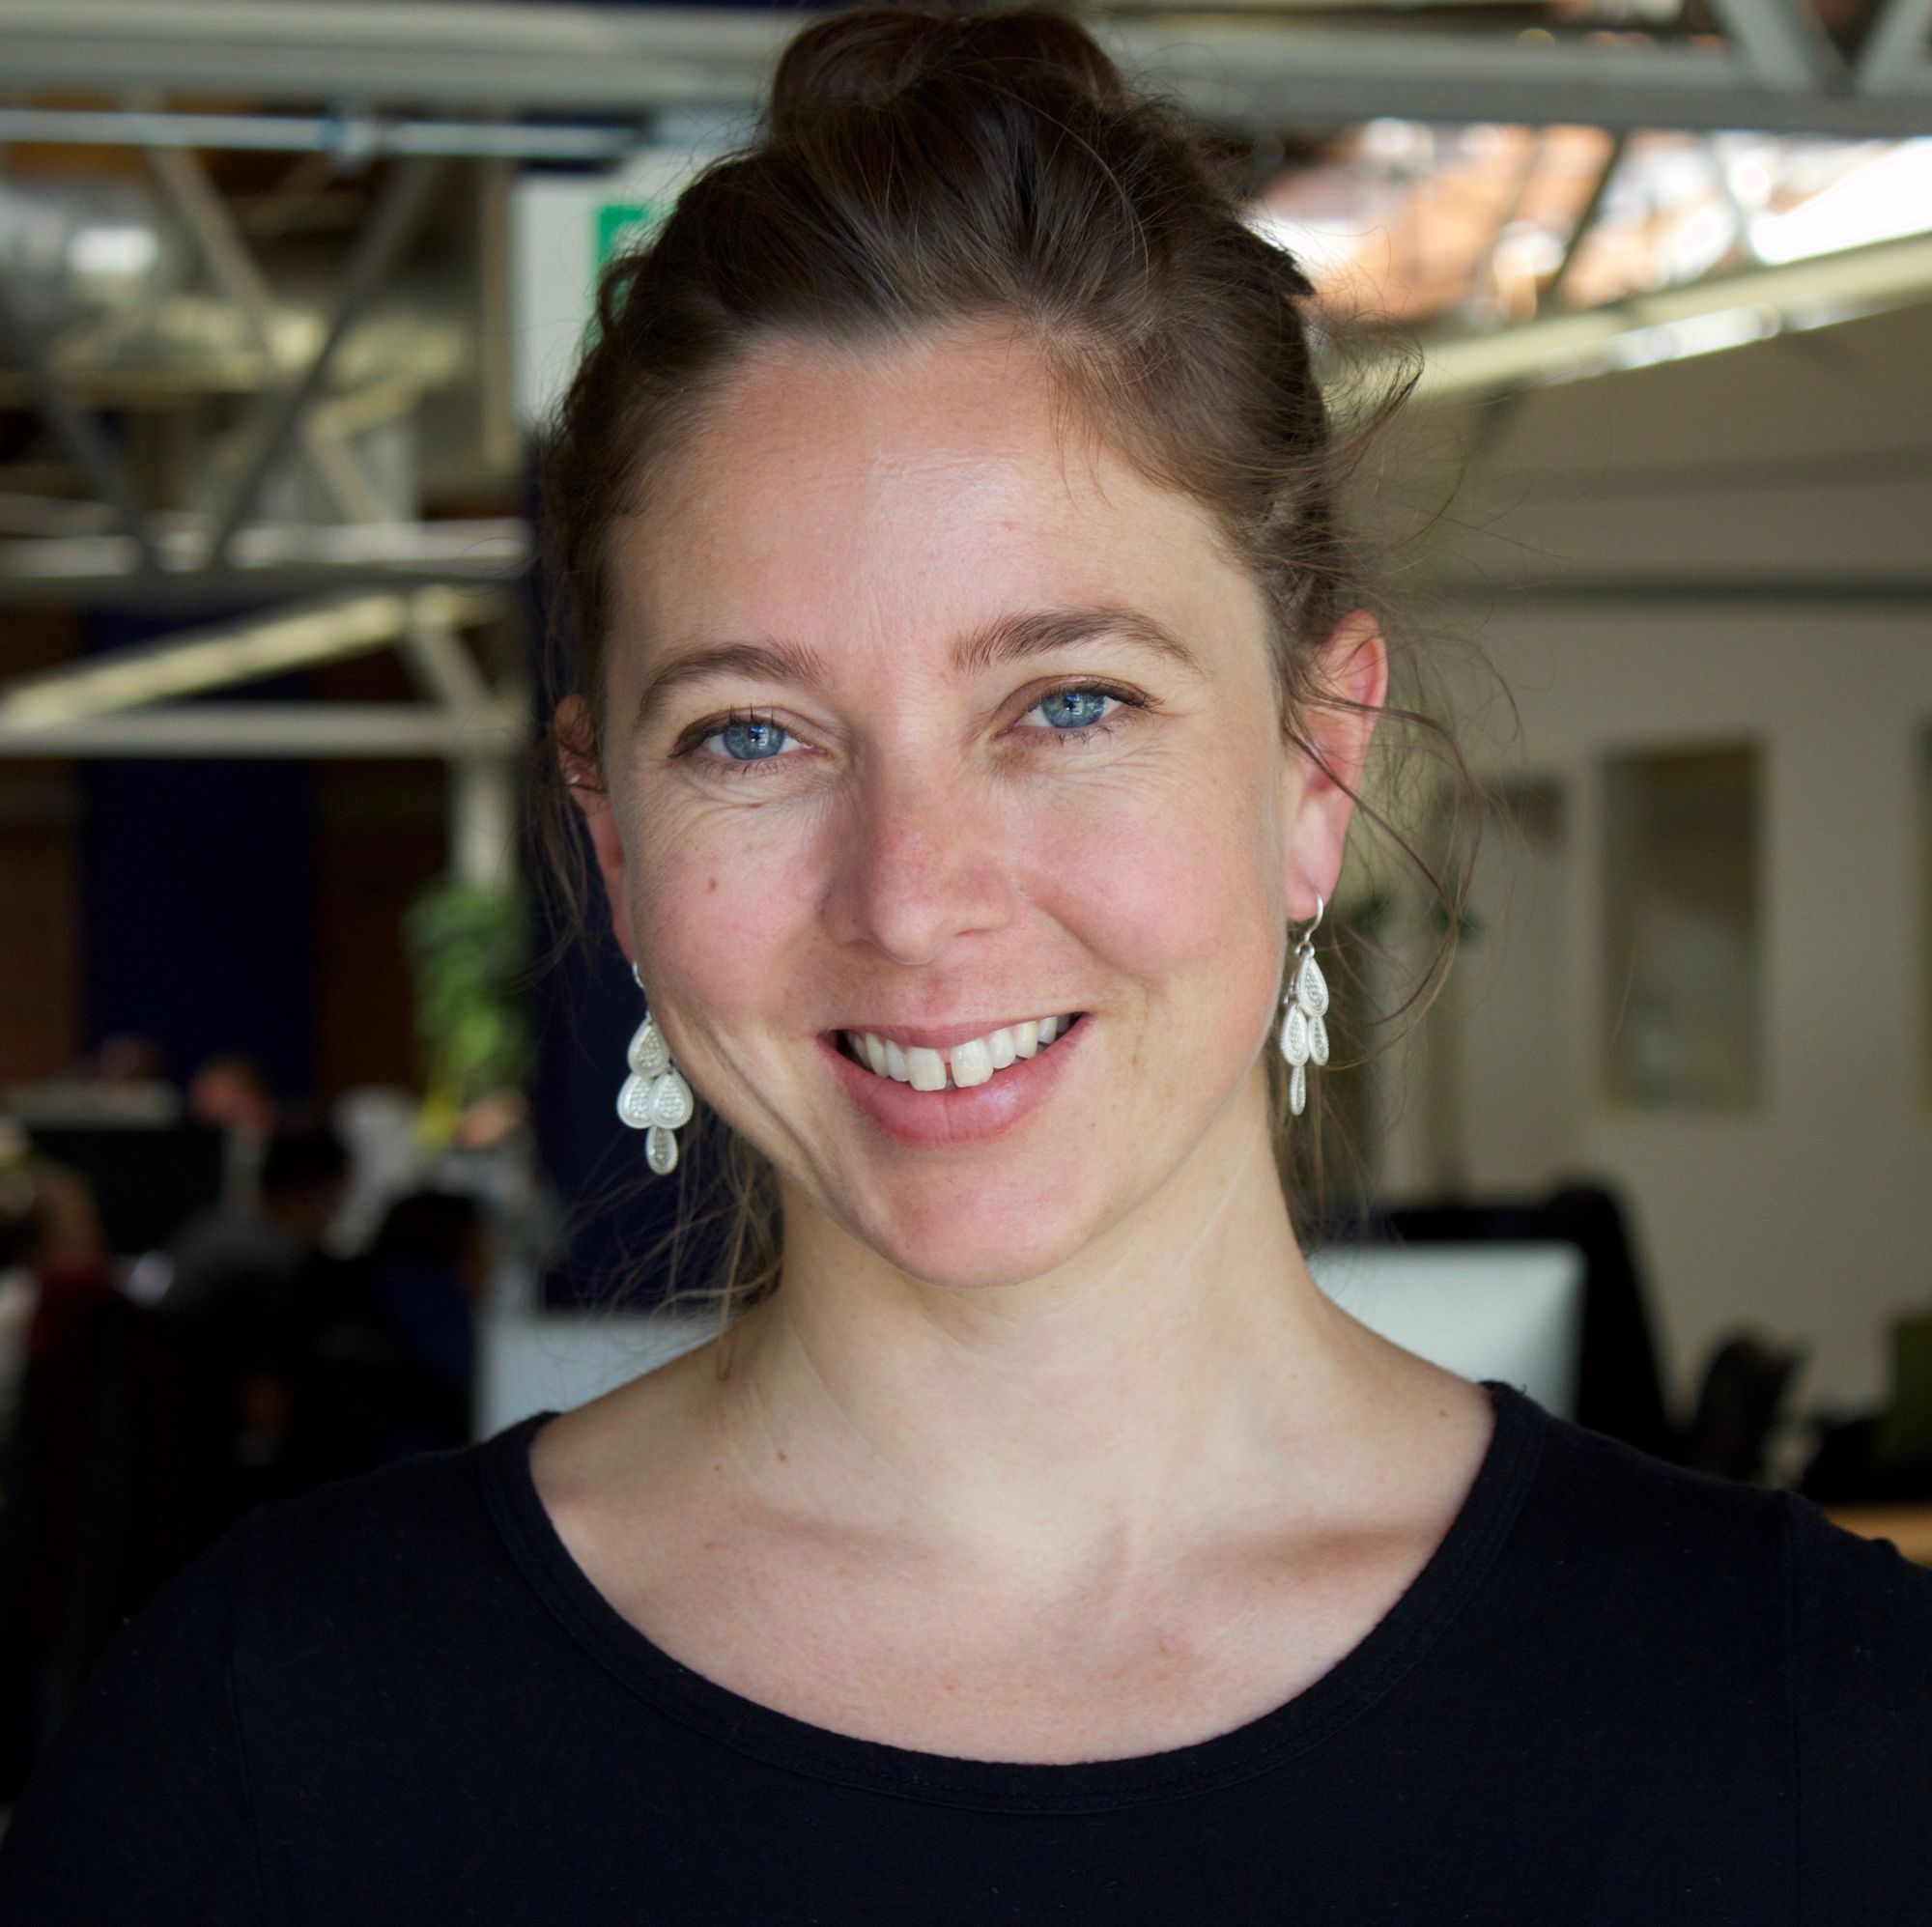 Lauren Locke-Paddon